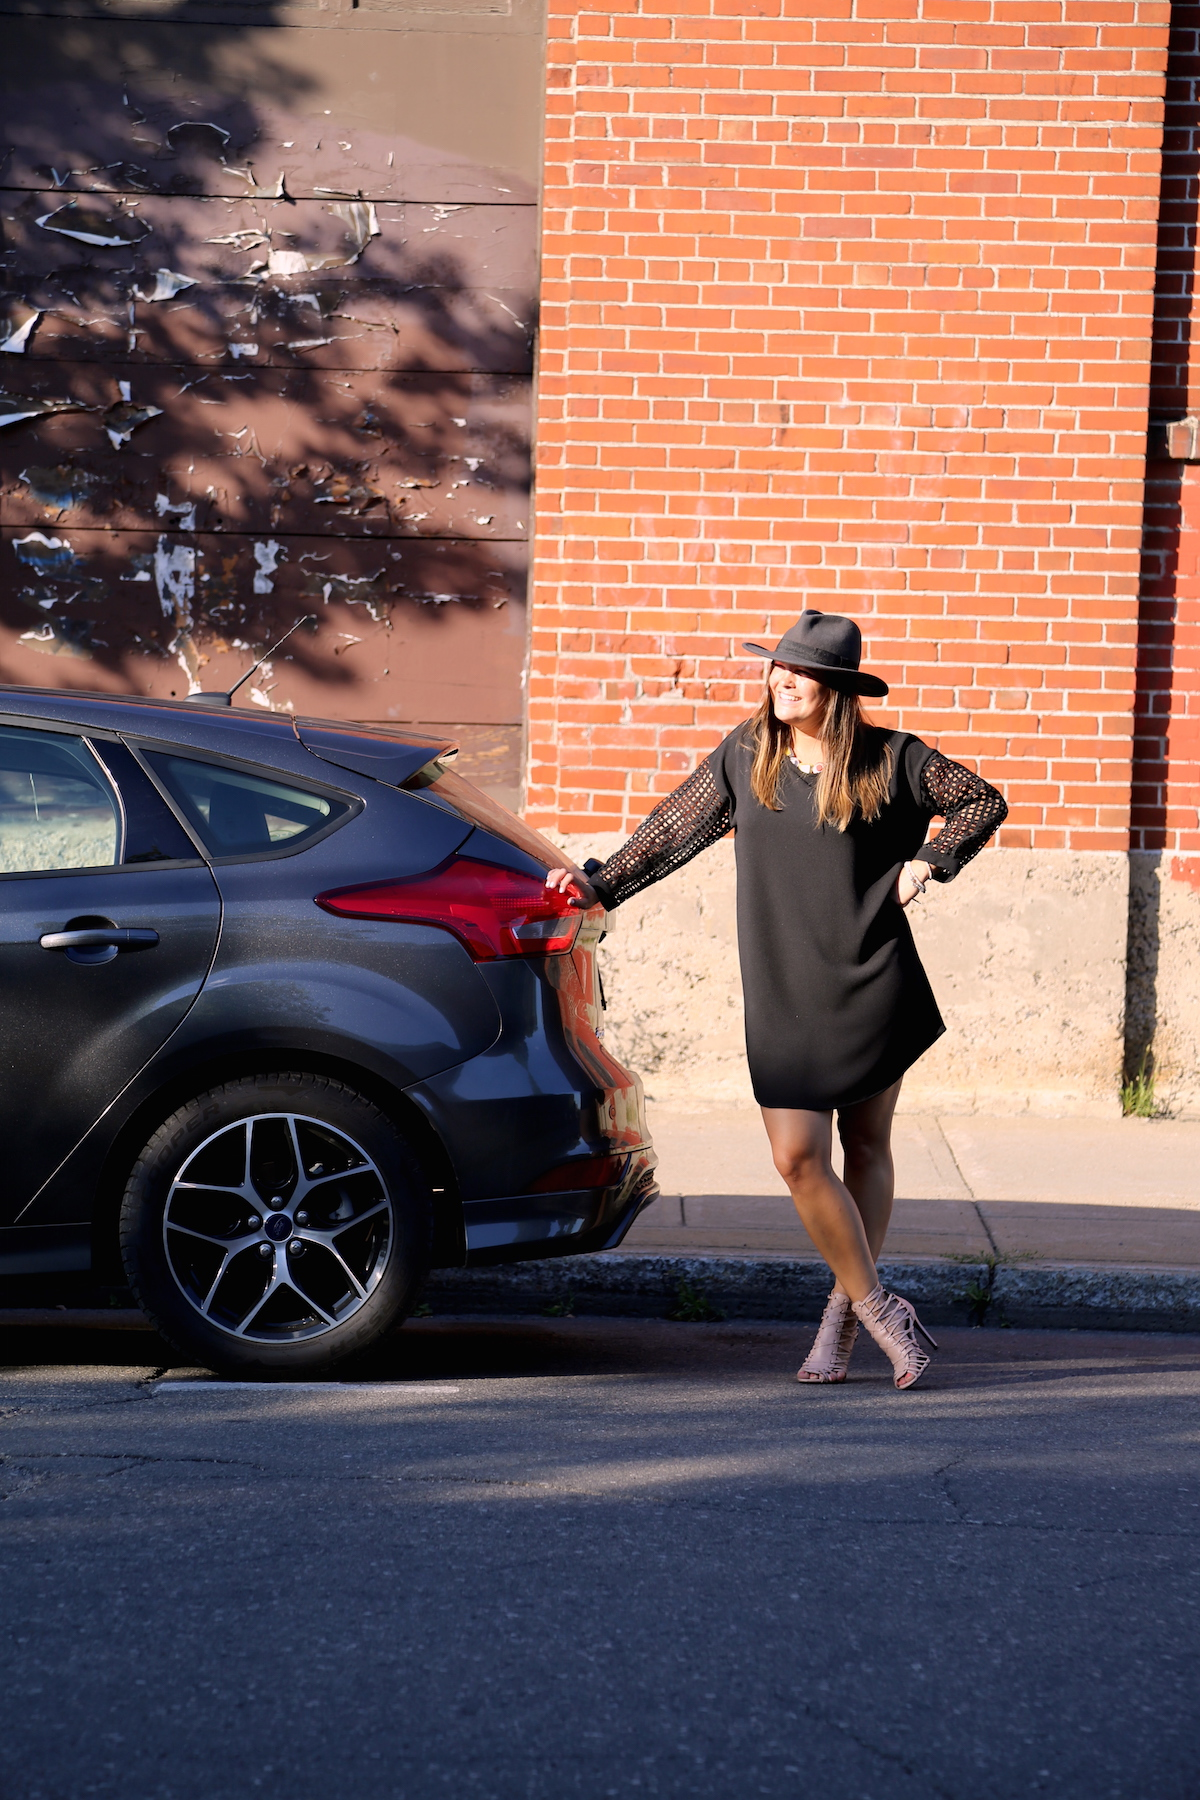 Ford_Canada_Focus2015_Querelles_29